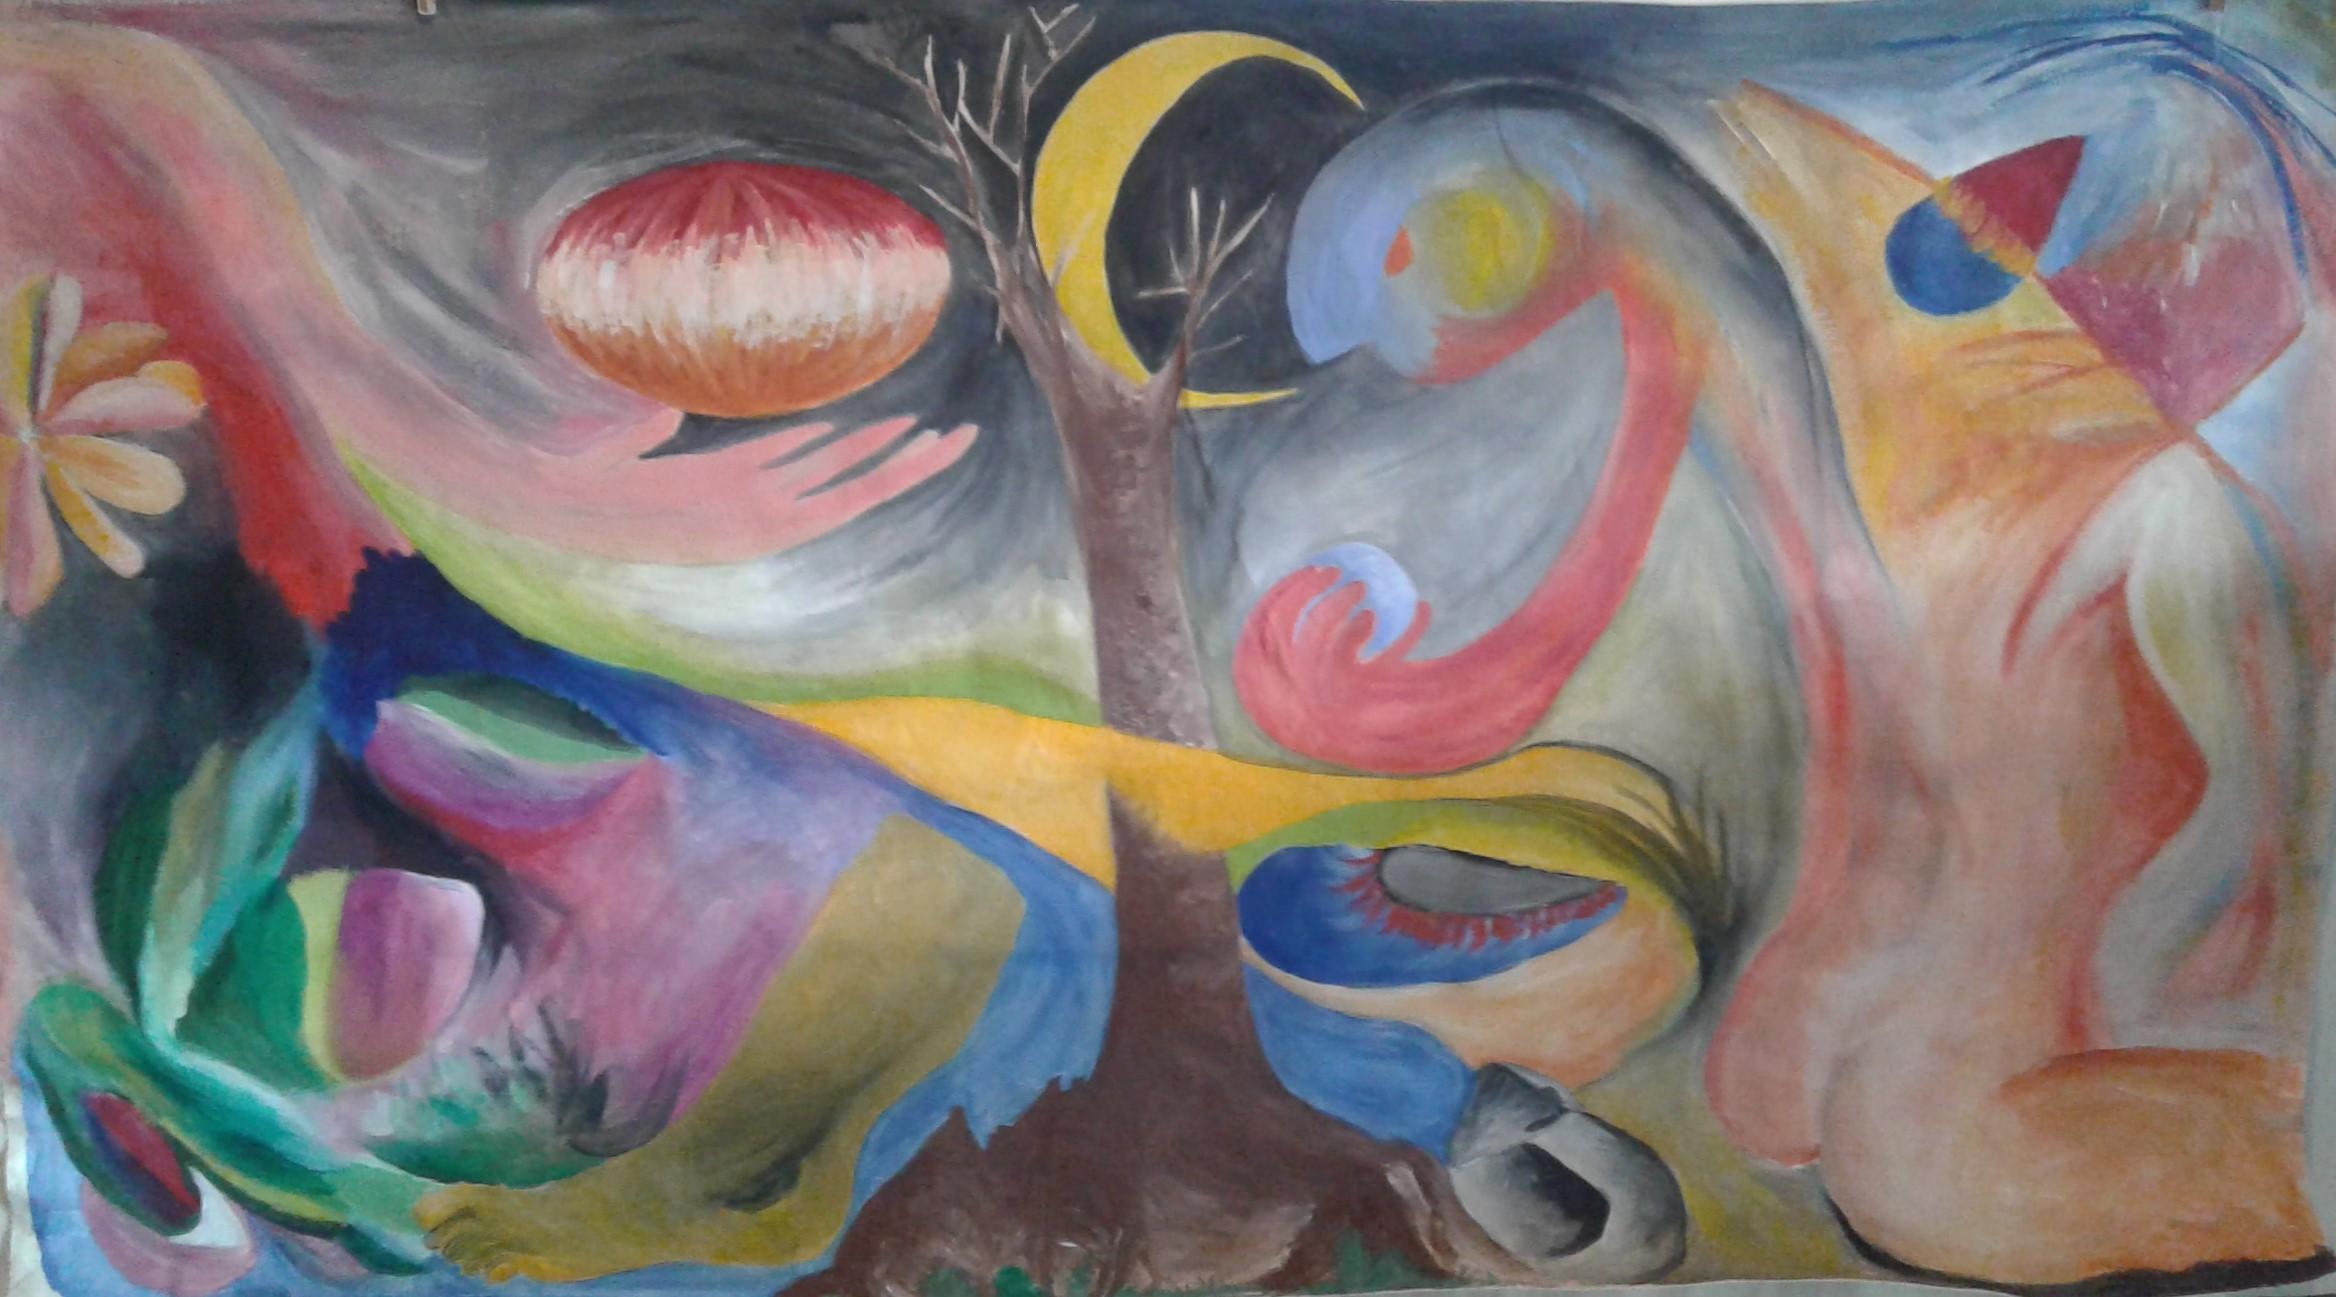 Painel homenagem às vanguardas - Tersarau